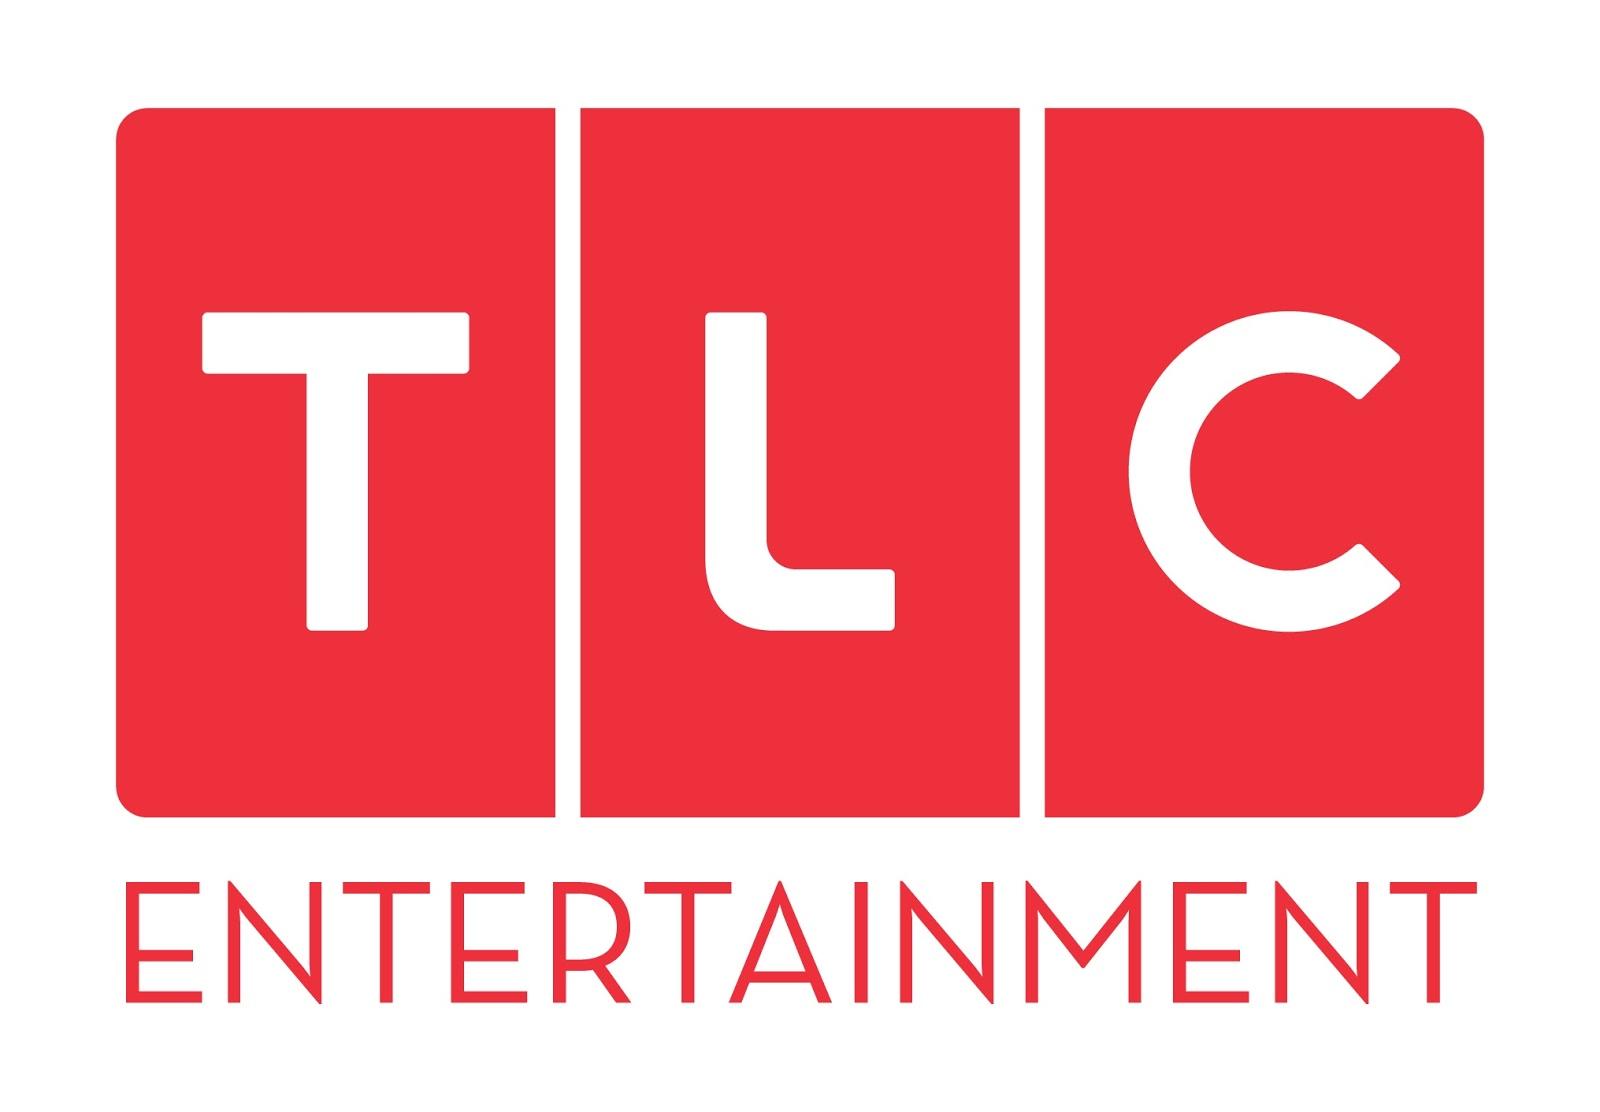 TLC ENTERTAINMENT NEW LOGO